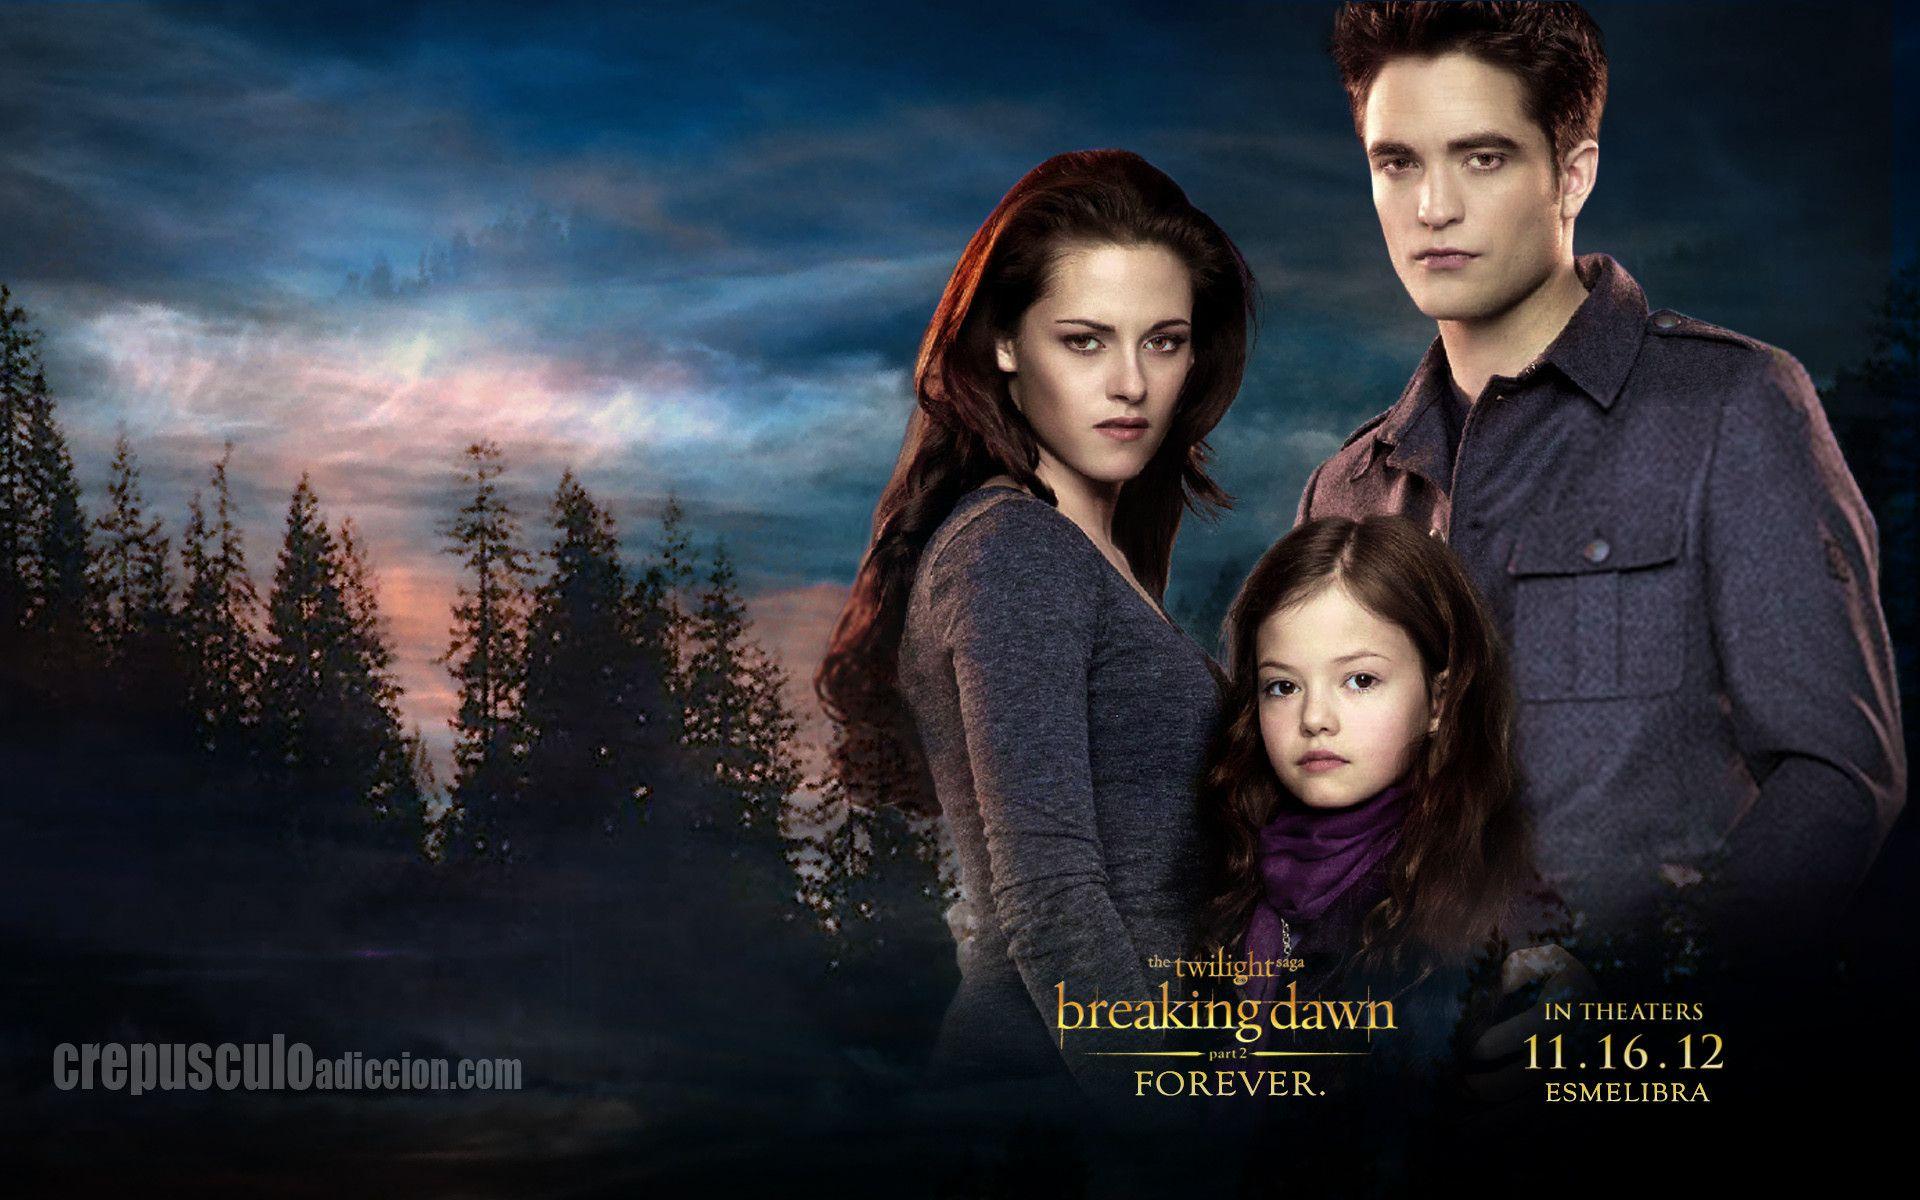 Res 1920x1200 Filme The Twilight Saga Breaking Dawn Part 2 Kristen Stewart Bella Swan Robert Filmes Norte Americano Romance